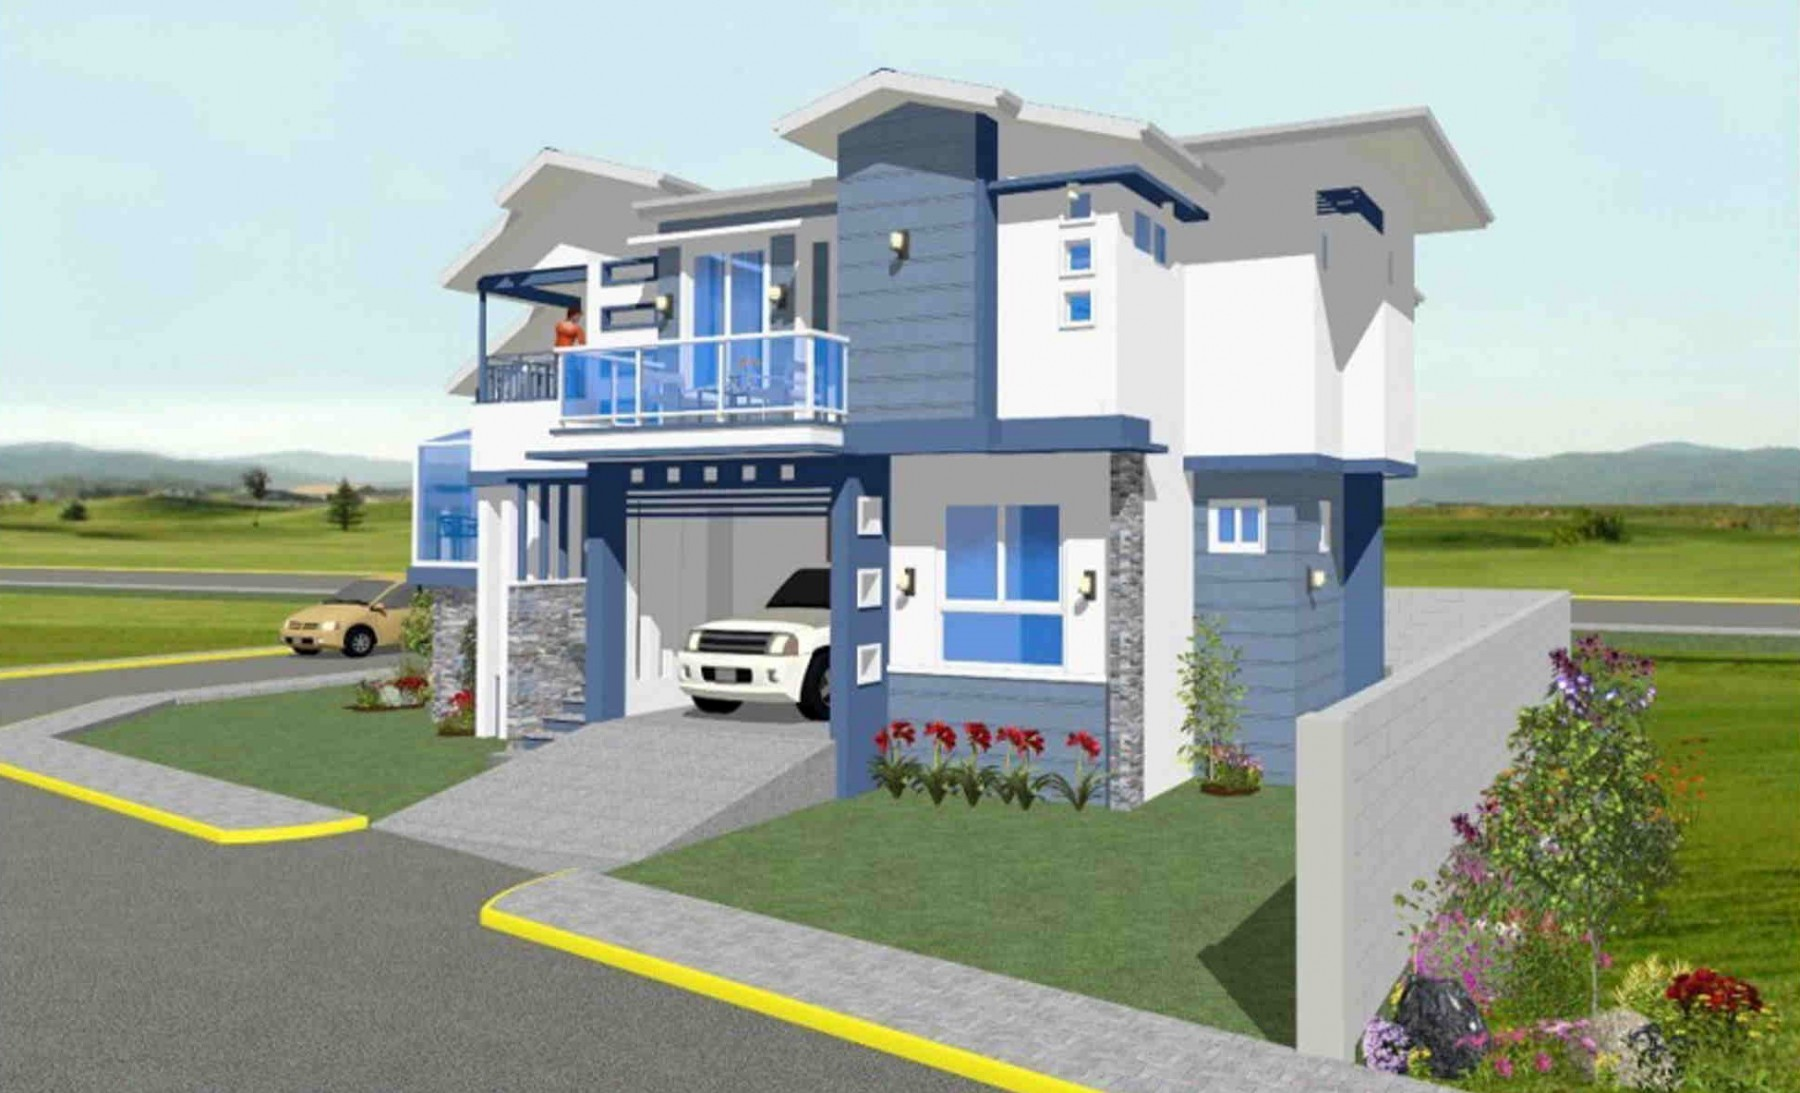 Rodante Bernabe's 2nd Place Residential Design